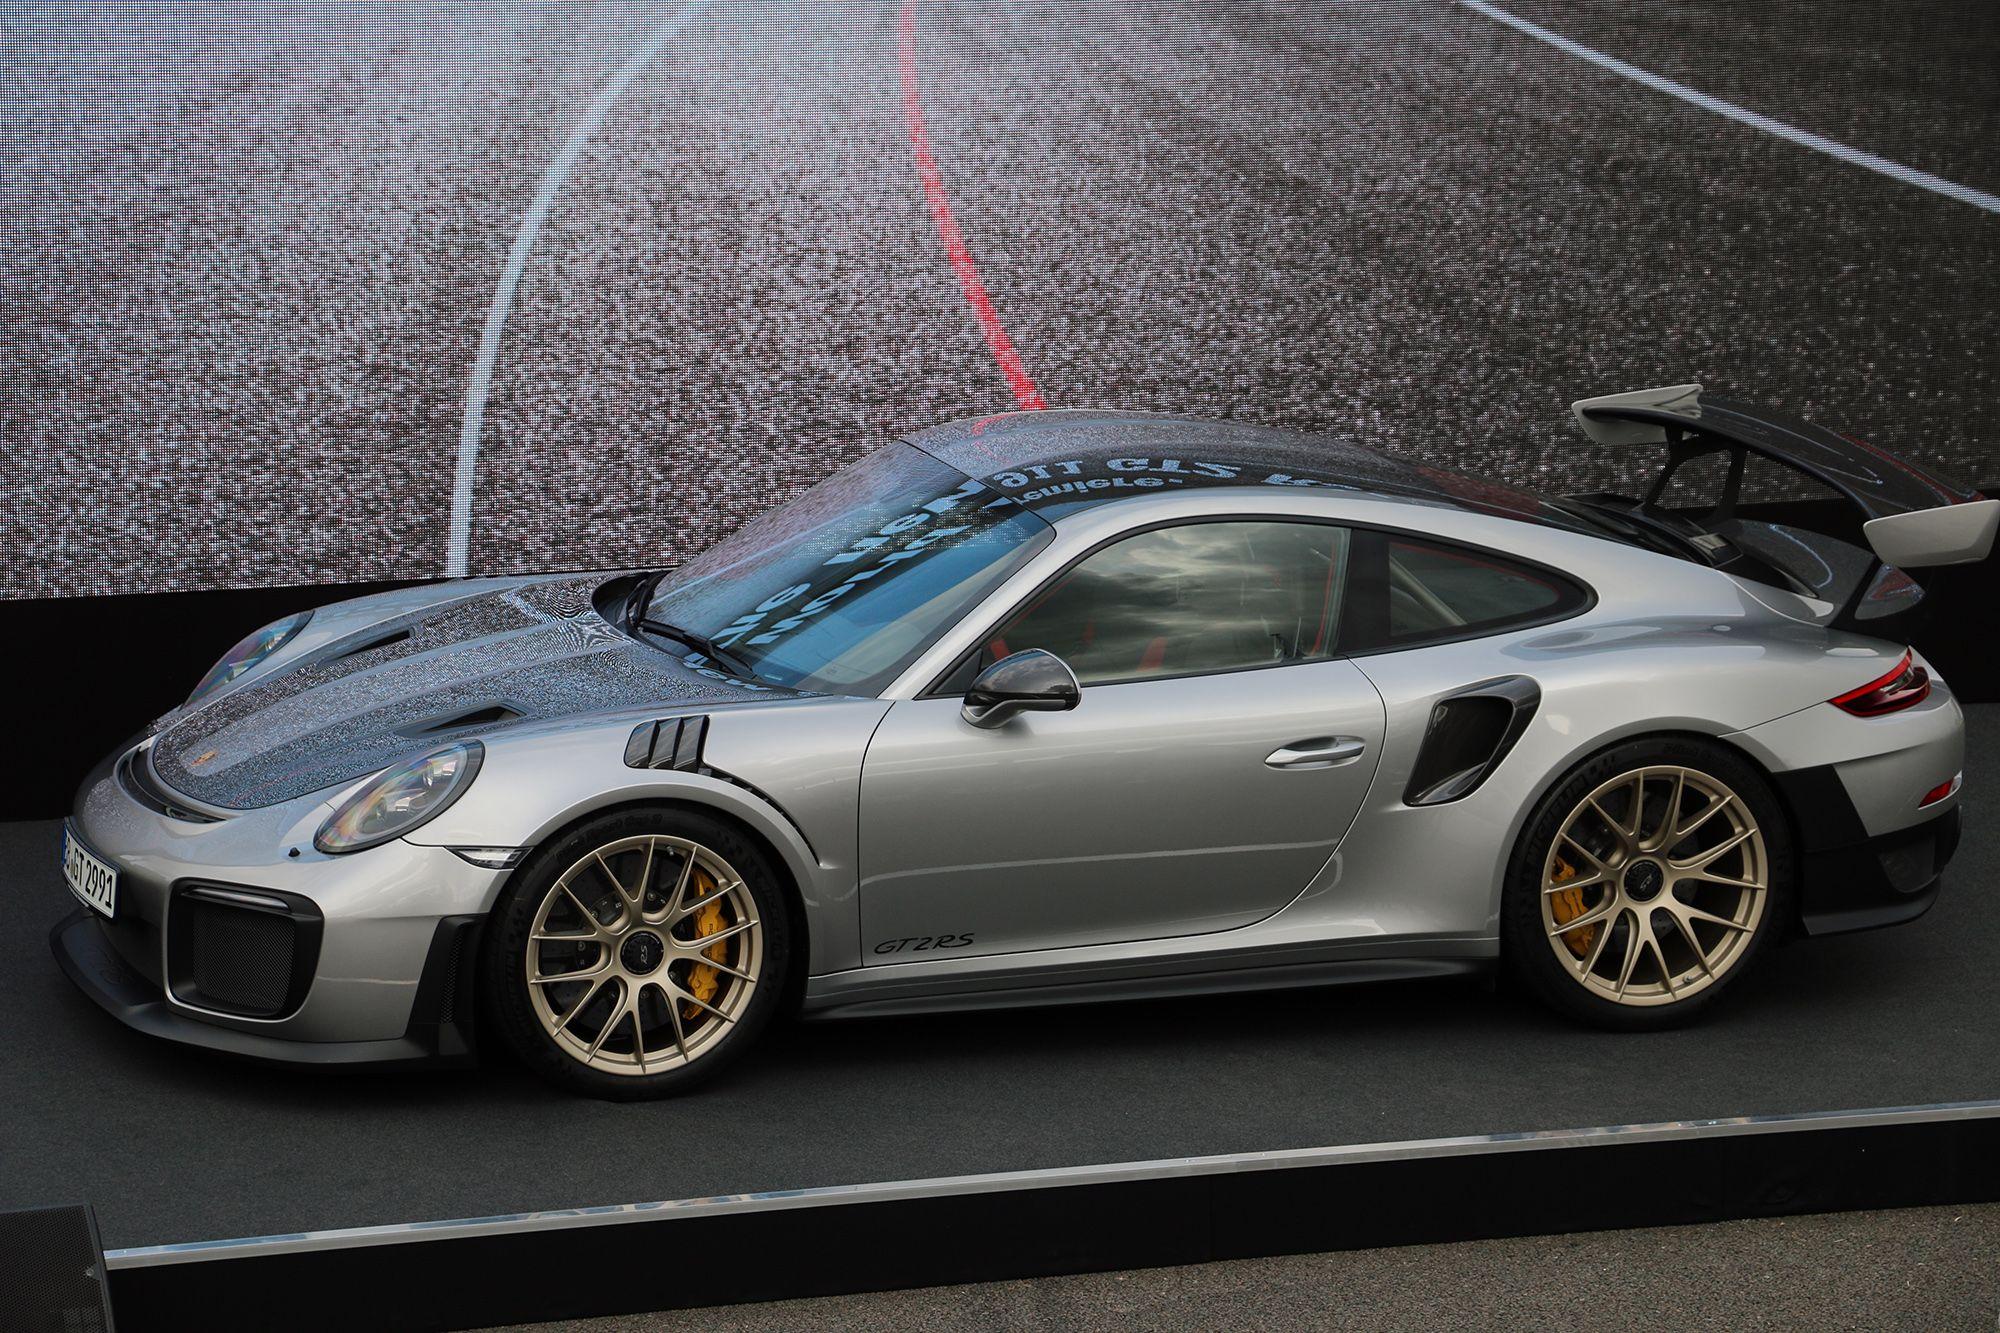 img-6781-jpg-1498843658 Wonderful Porsche 911 Gt2 Wheel for Sale Cars Trend